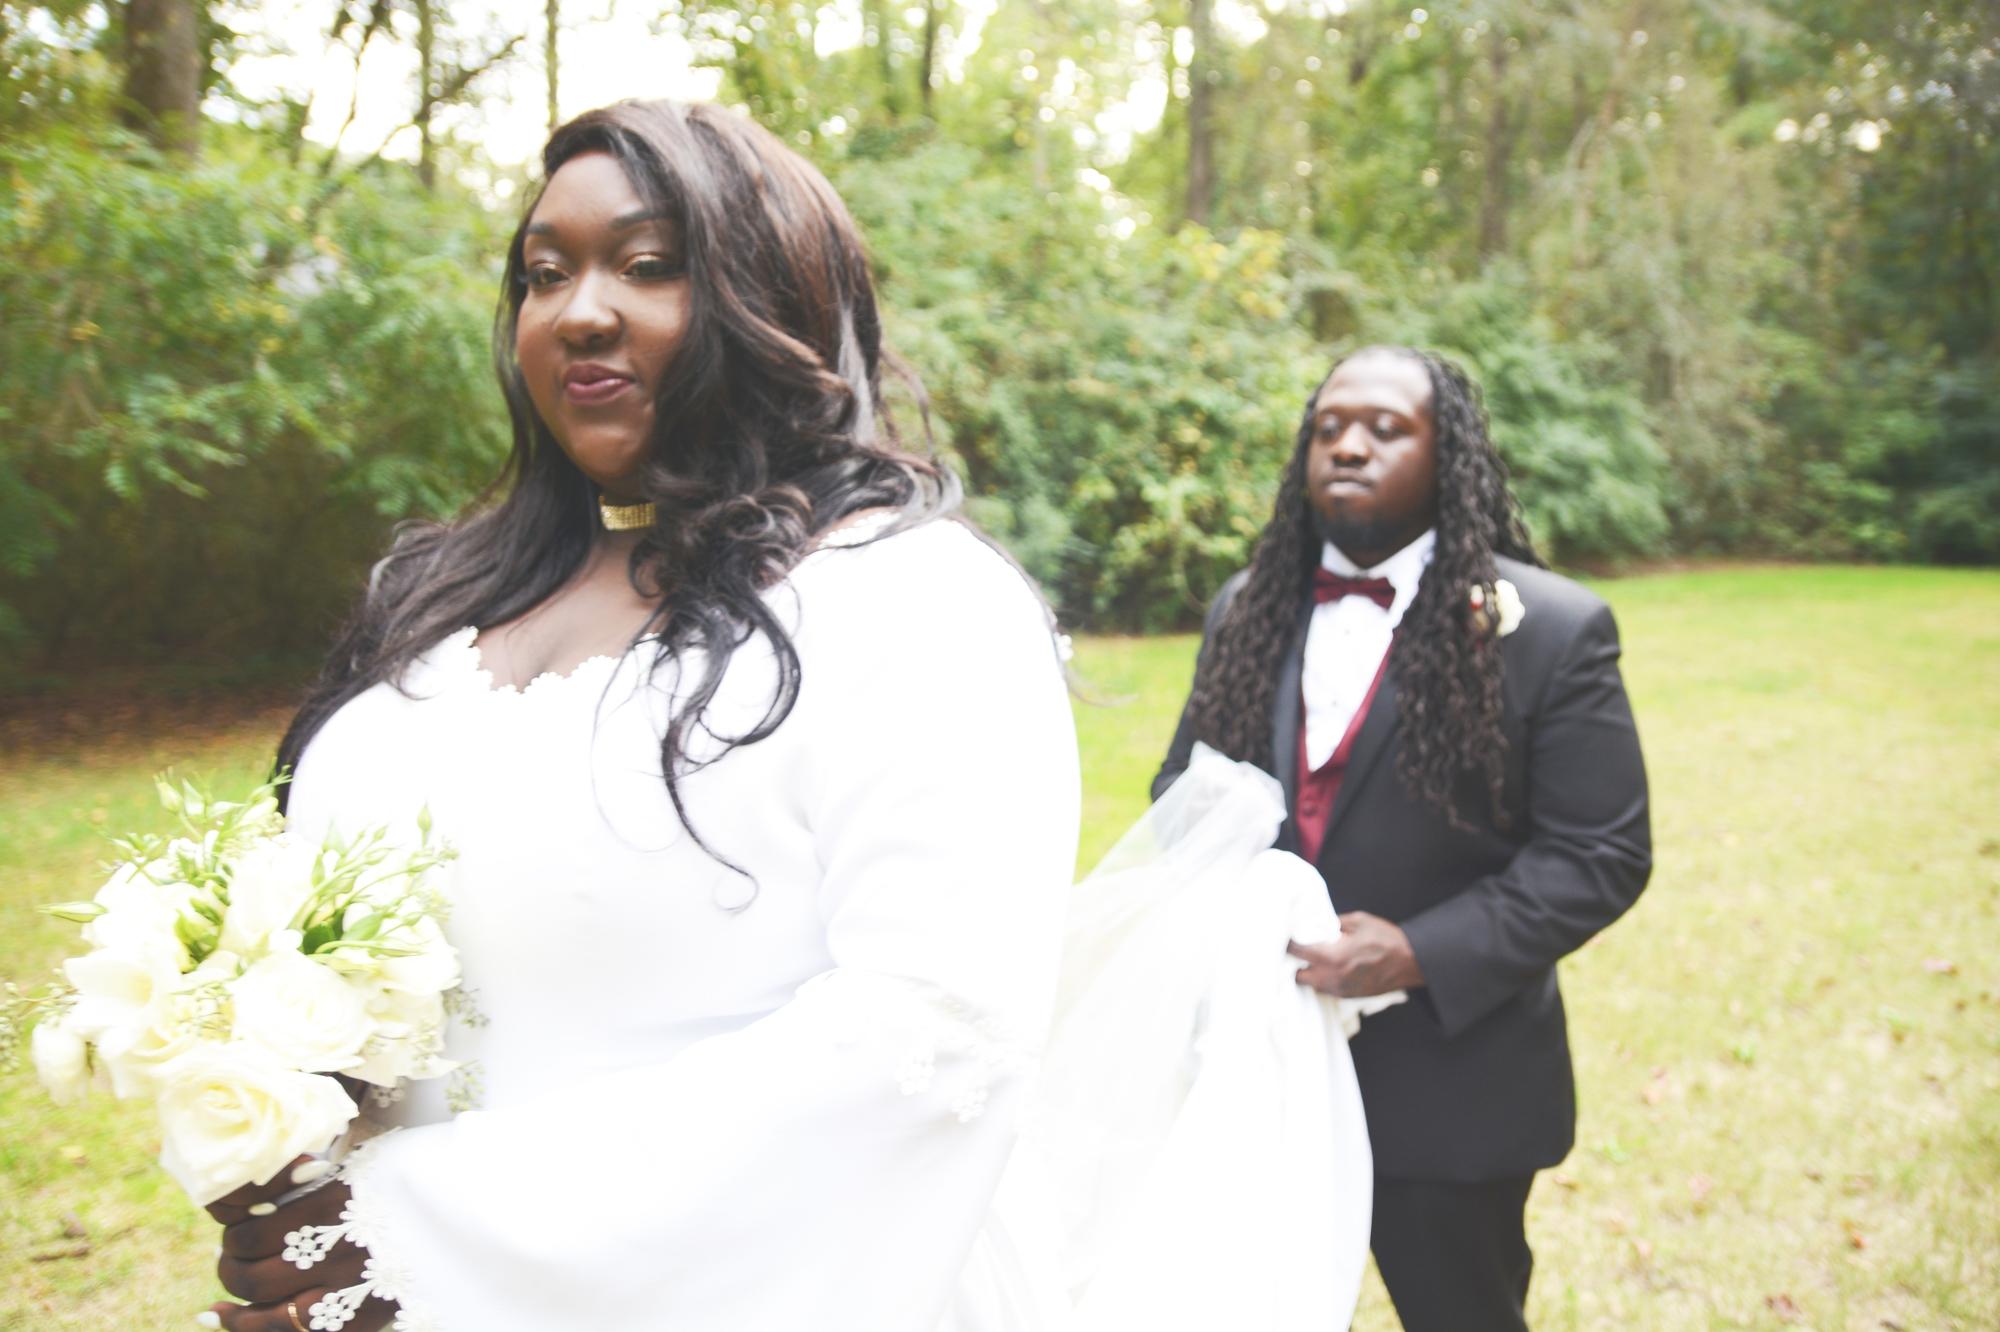 fairfield-clubhouse-oxblood-amethyst-wedding-six-hearts-photograpgt011